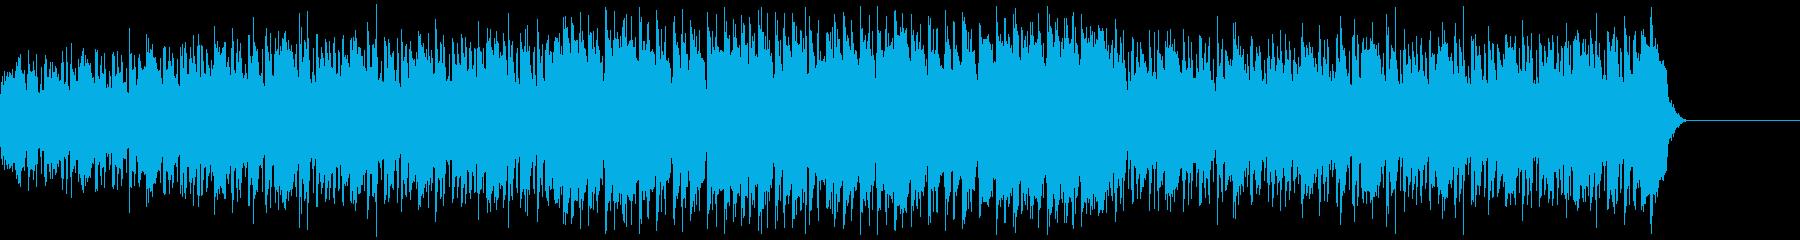 CM・夏のビーチ・レゲエの再生済みの波形